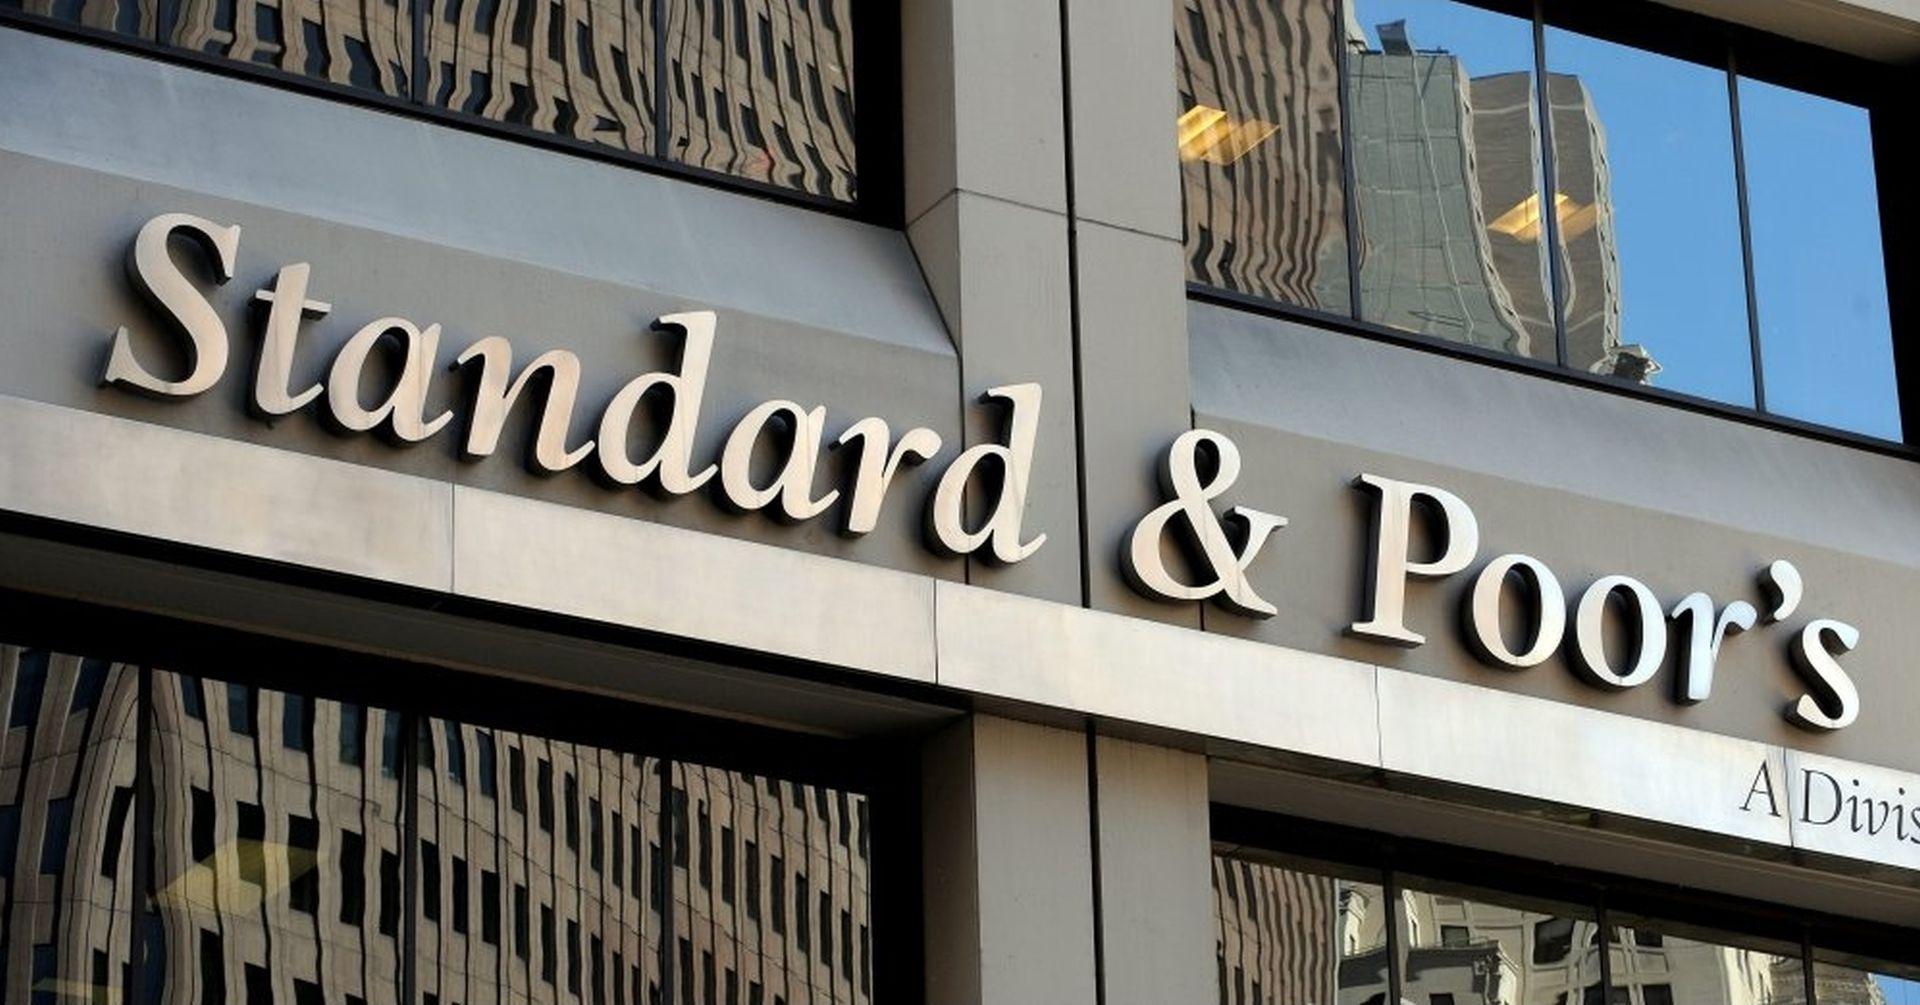 S&P zadržao rejting Hrvatske na 'BB+', poboljšao izglede na pozitivne